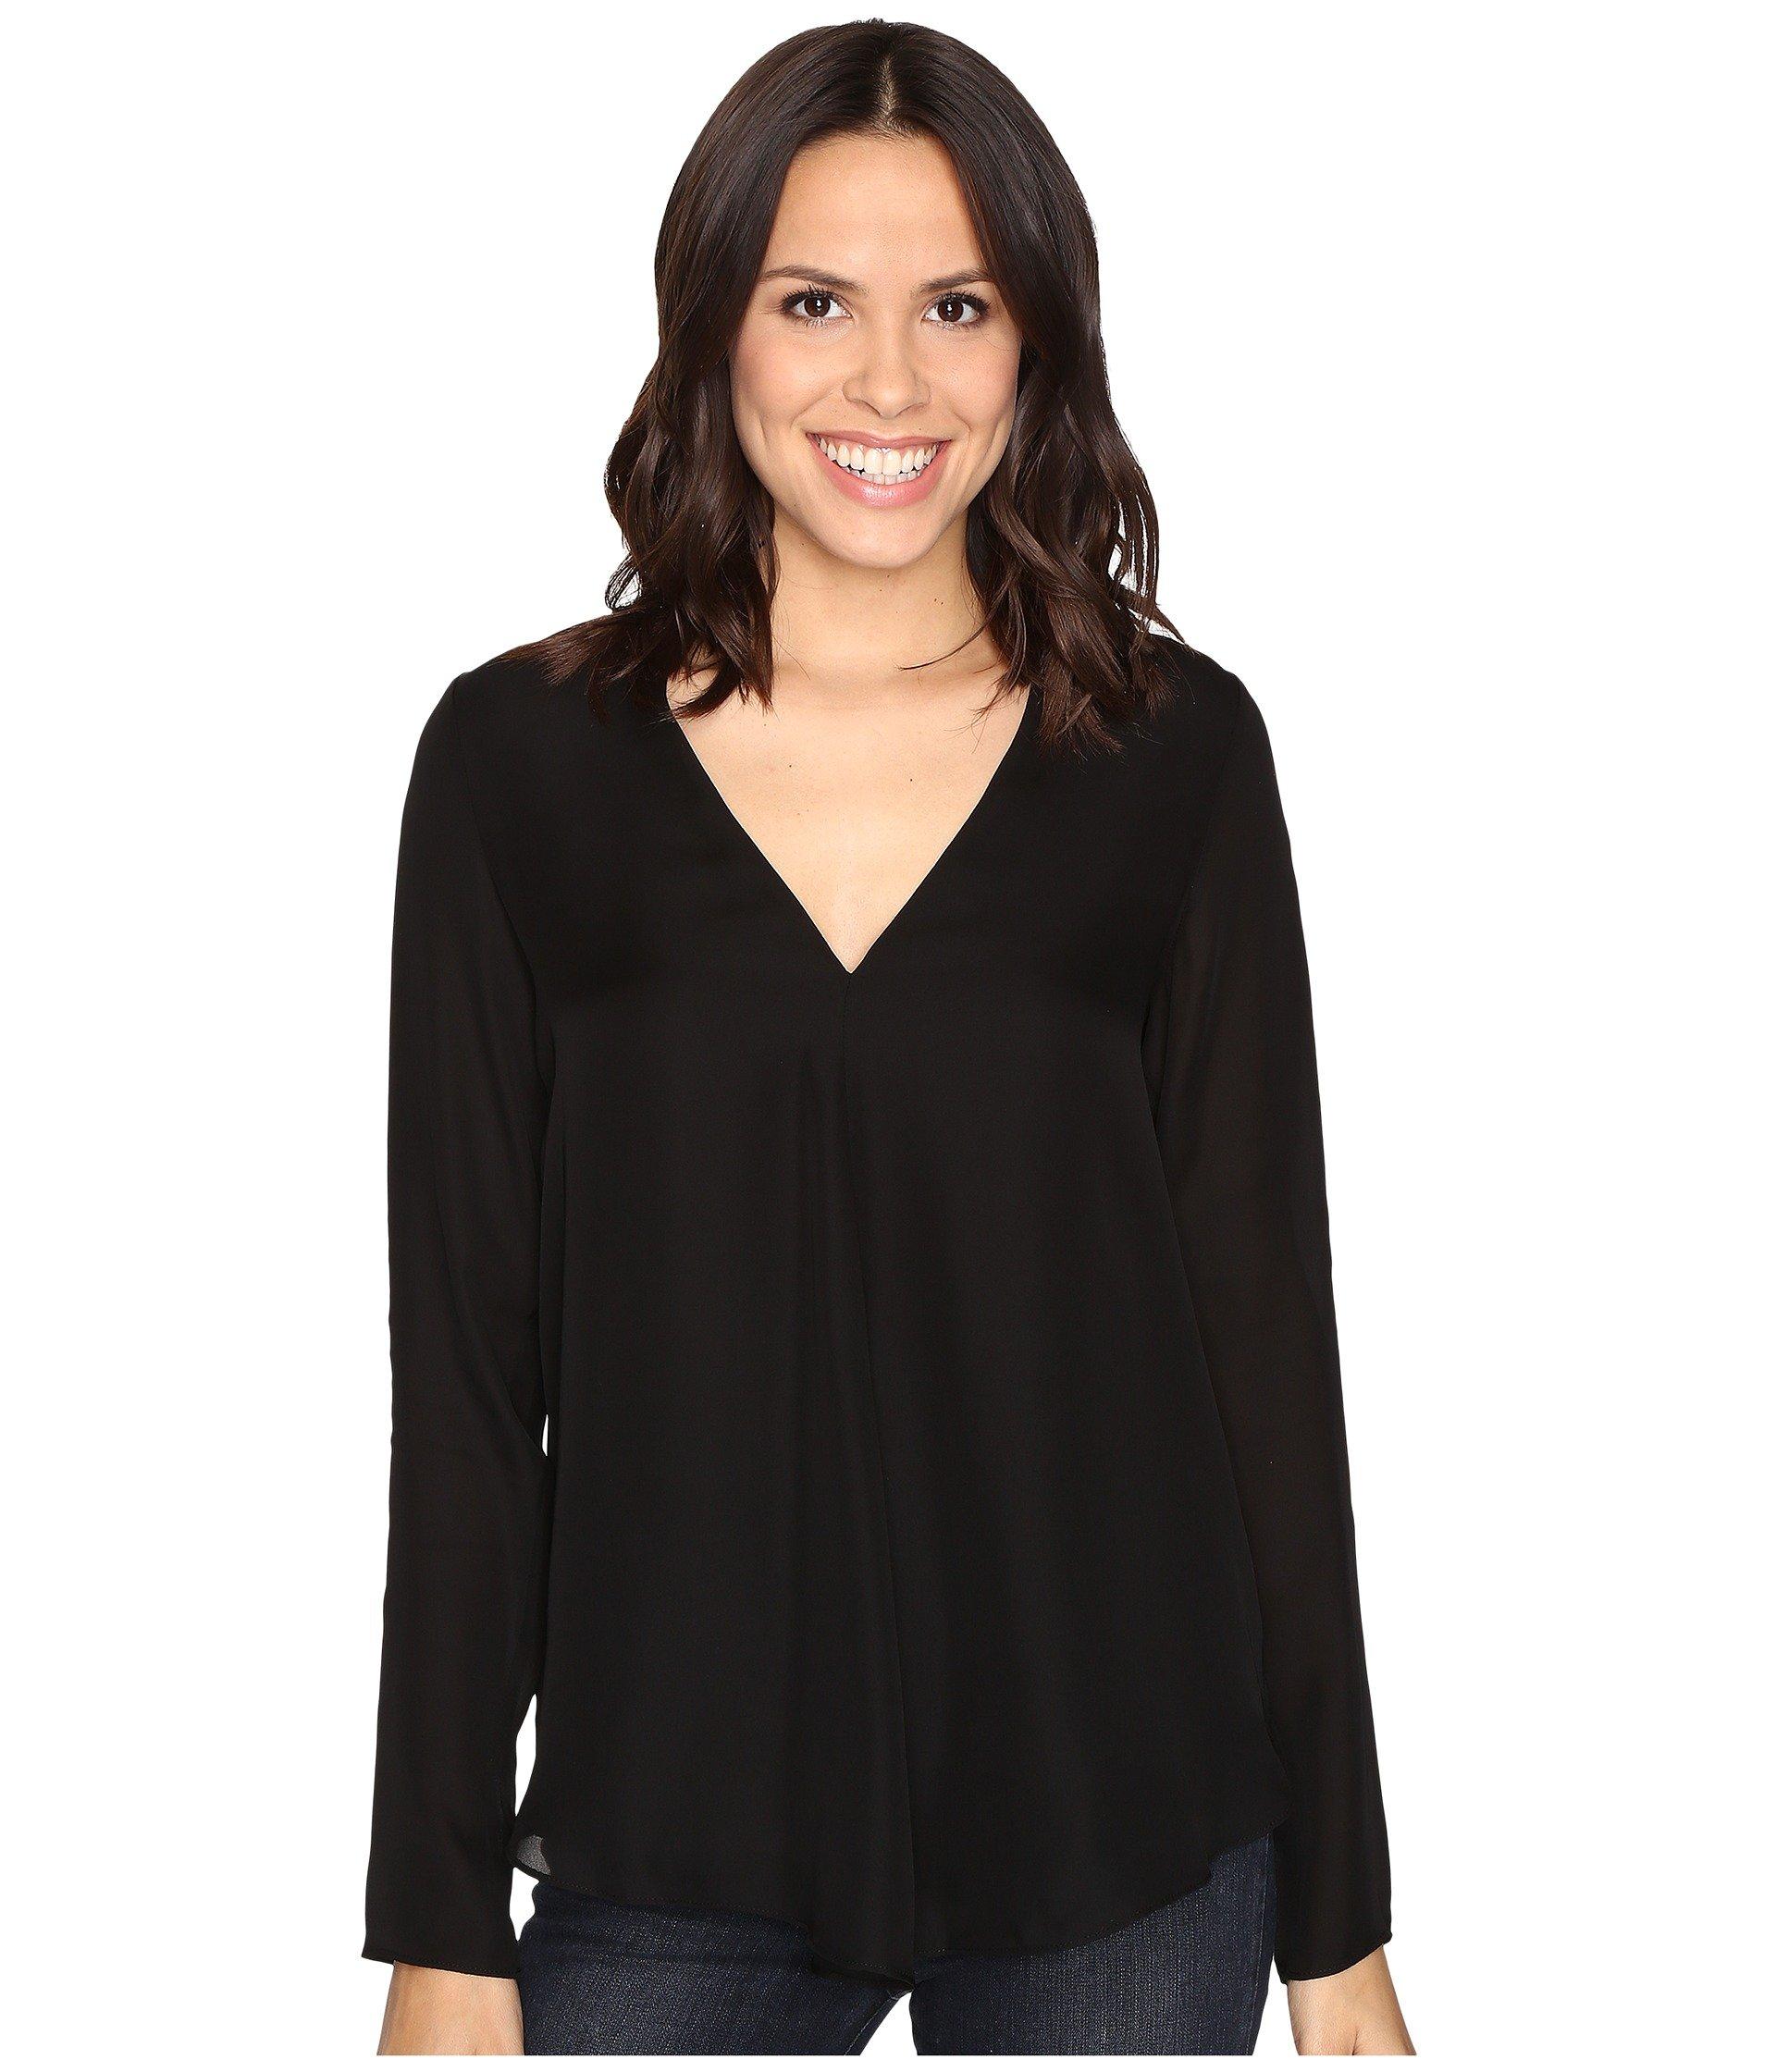 HEATHER Silk Double Layer Long Sleeve Top, Black